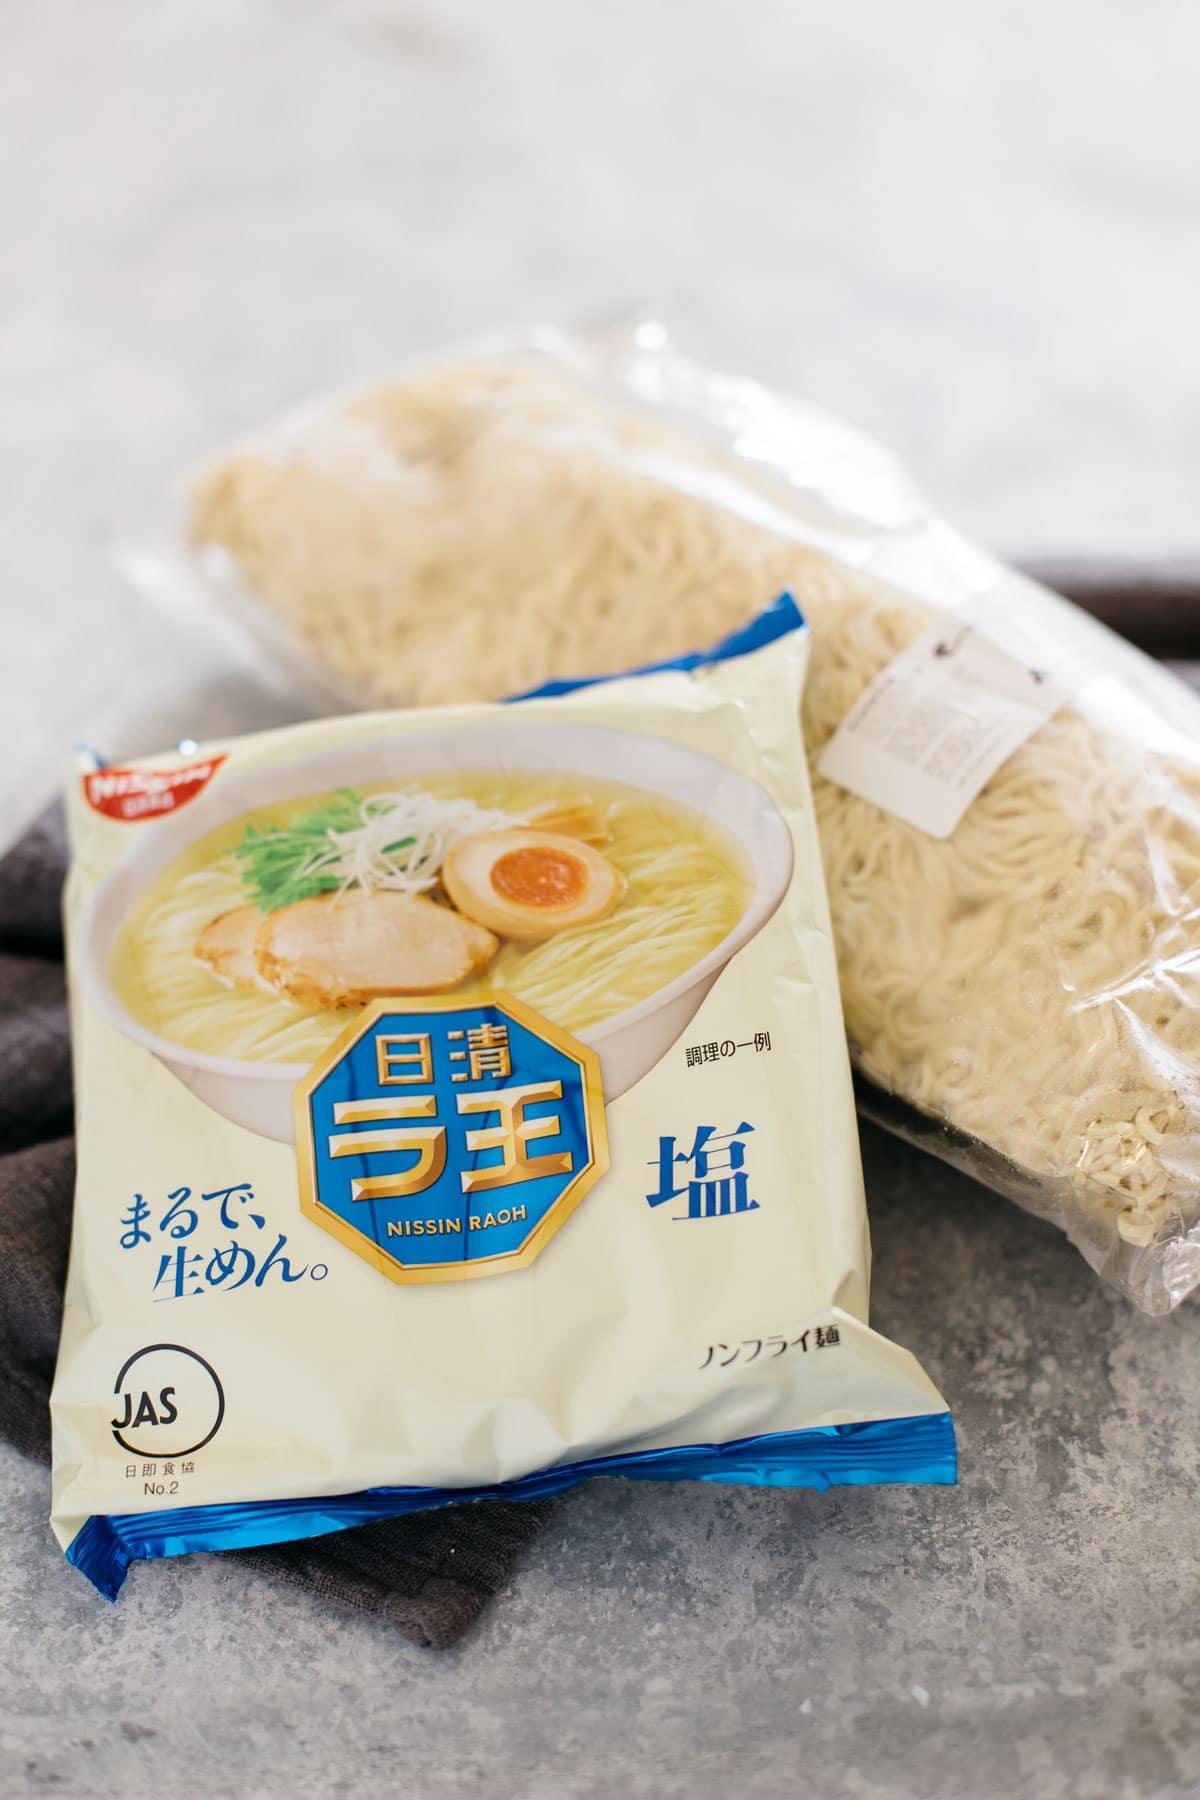 ramen noodle packets